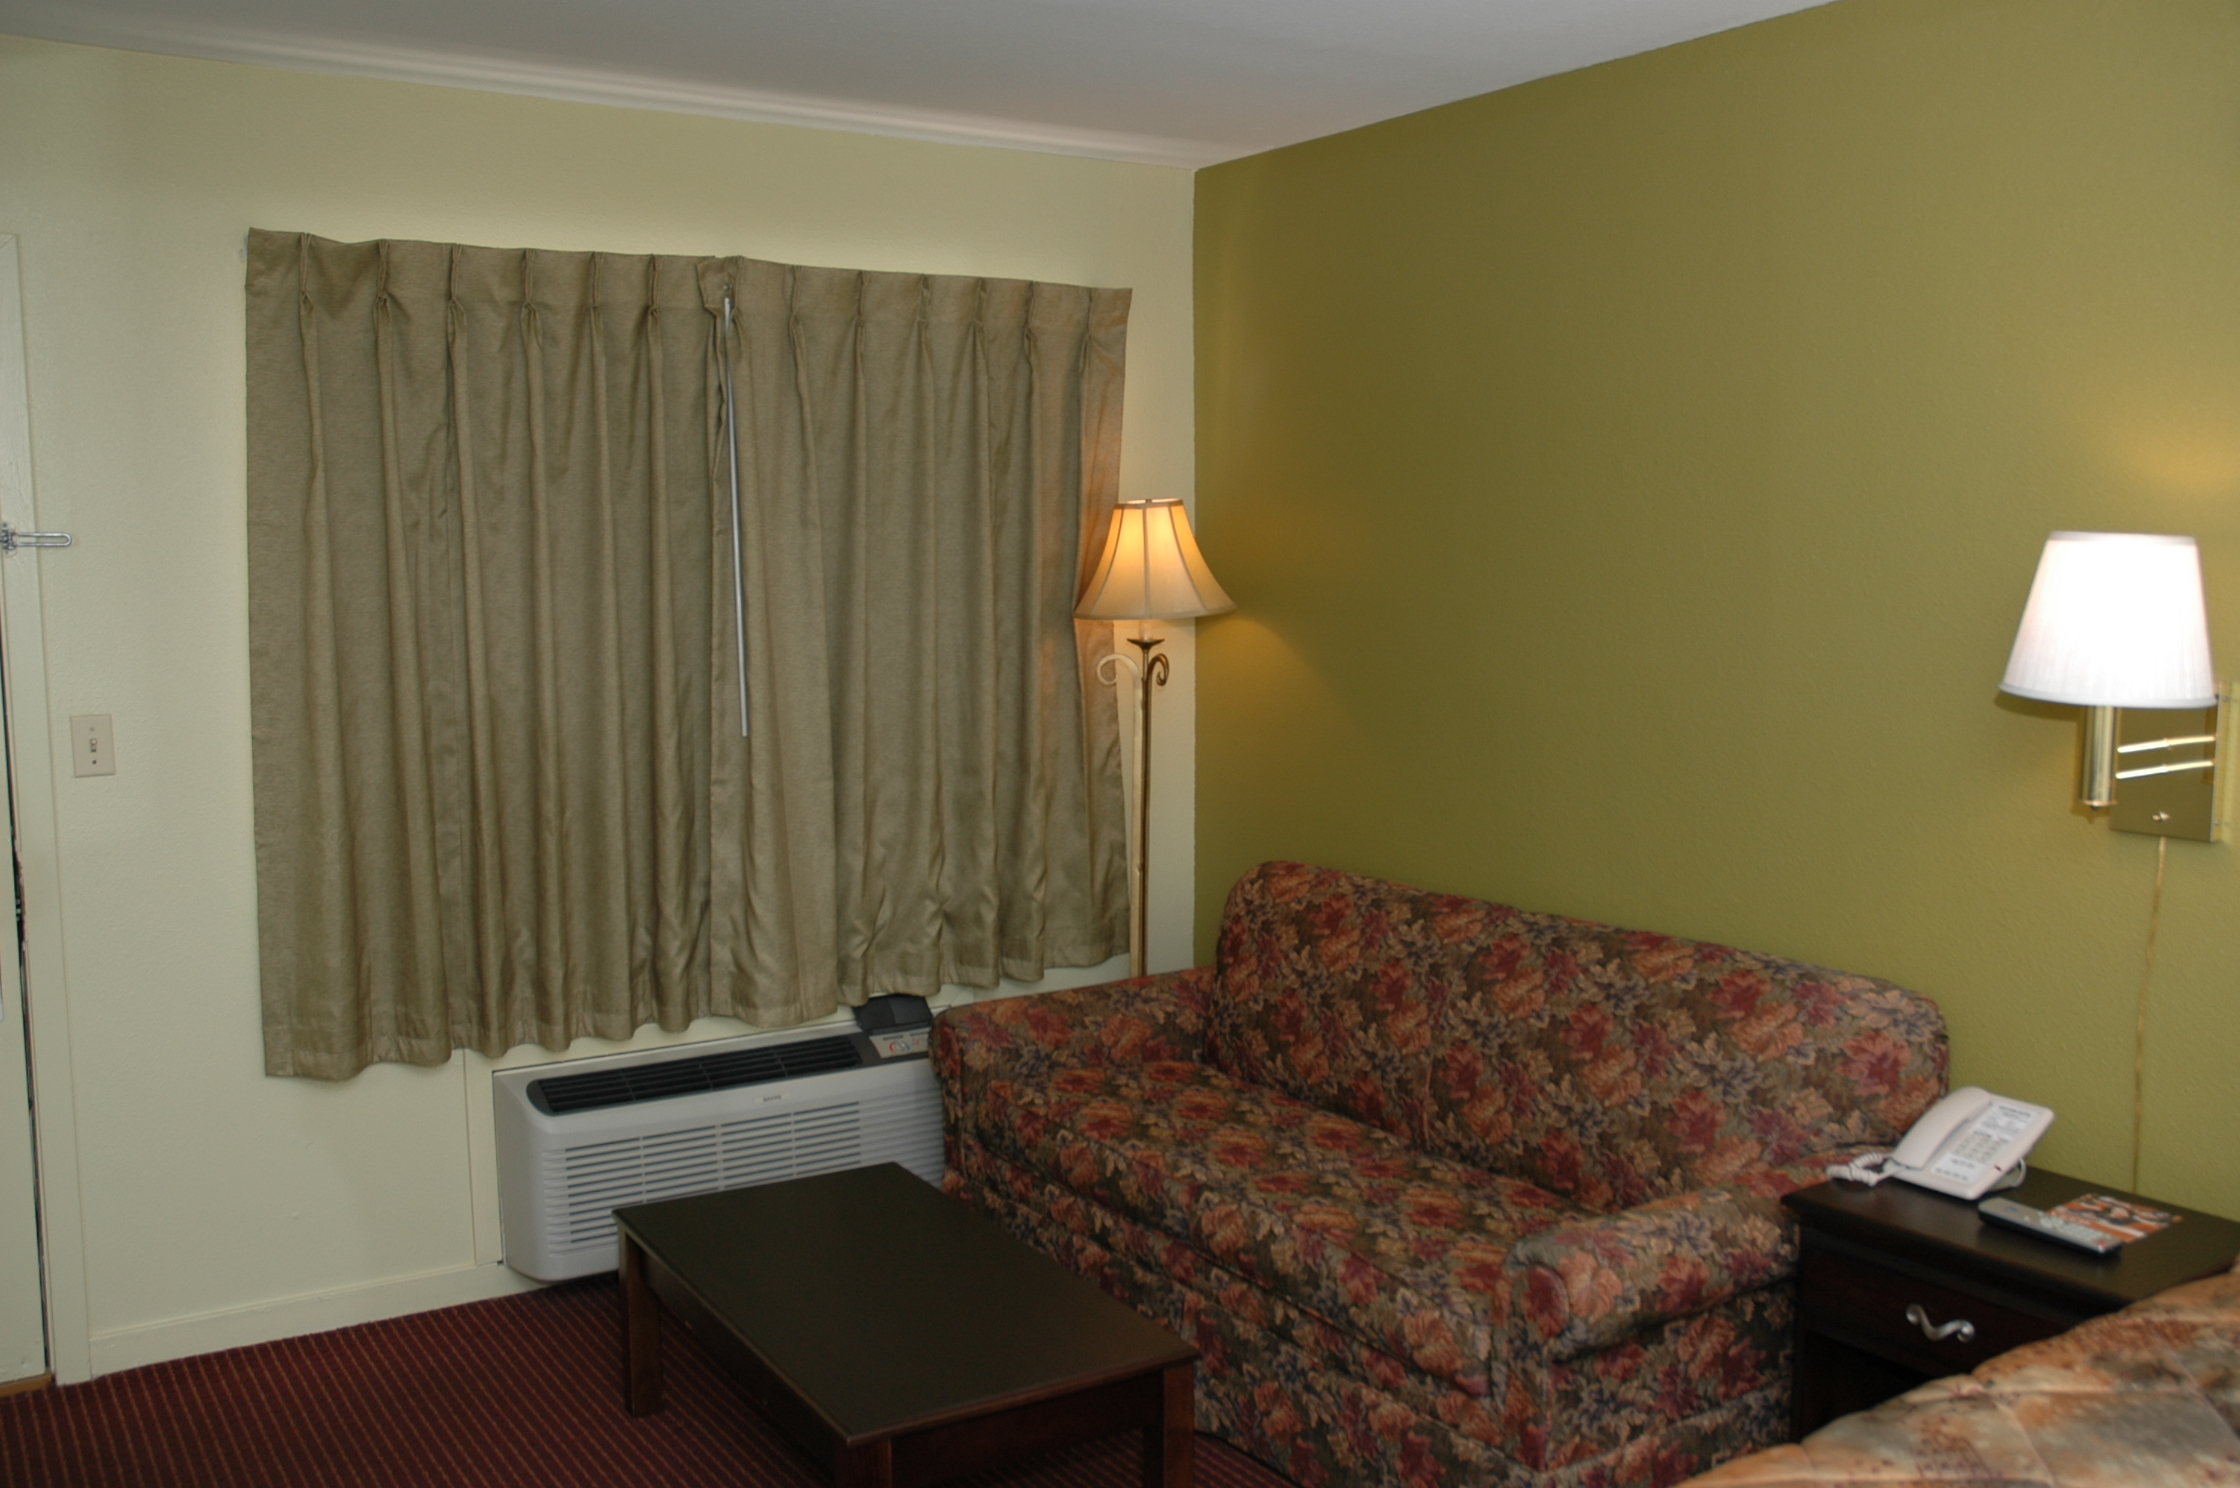 Western Motel, Prentiss MS